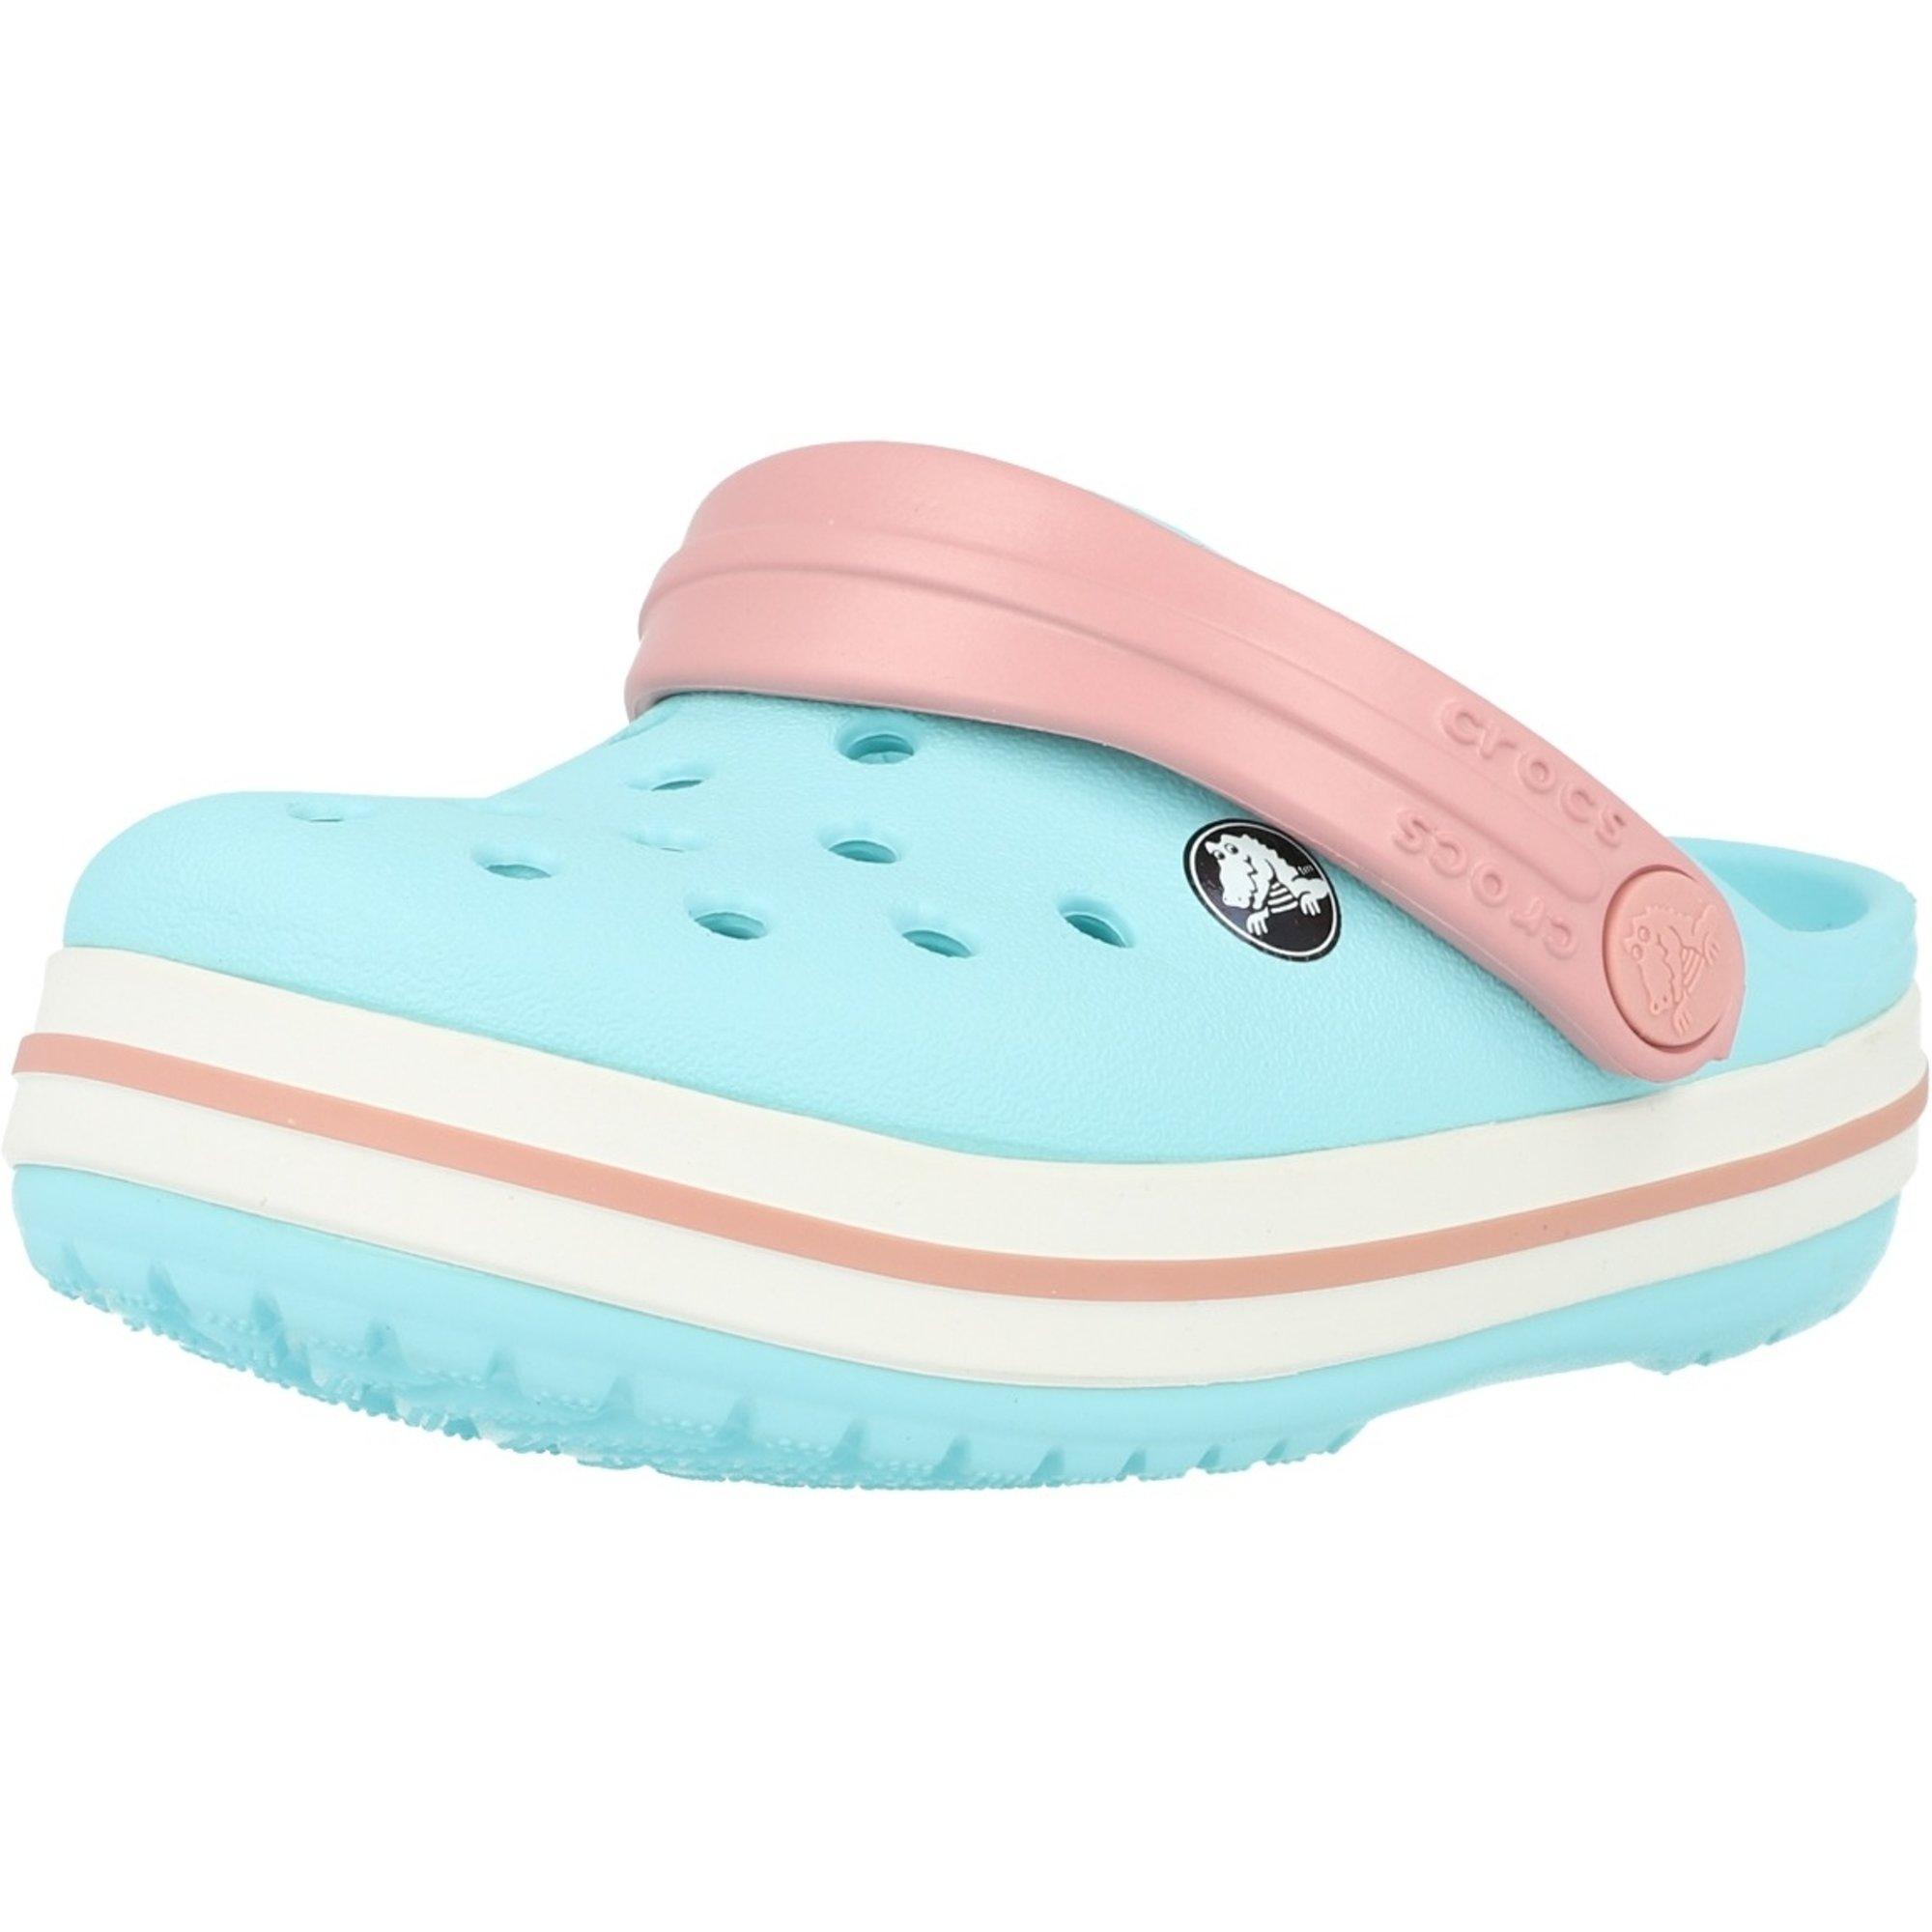 Crocs Kids Crocband Clog Ice Blue/White Croslite